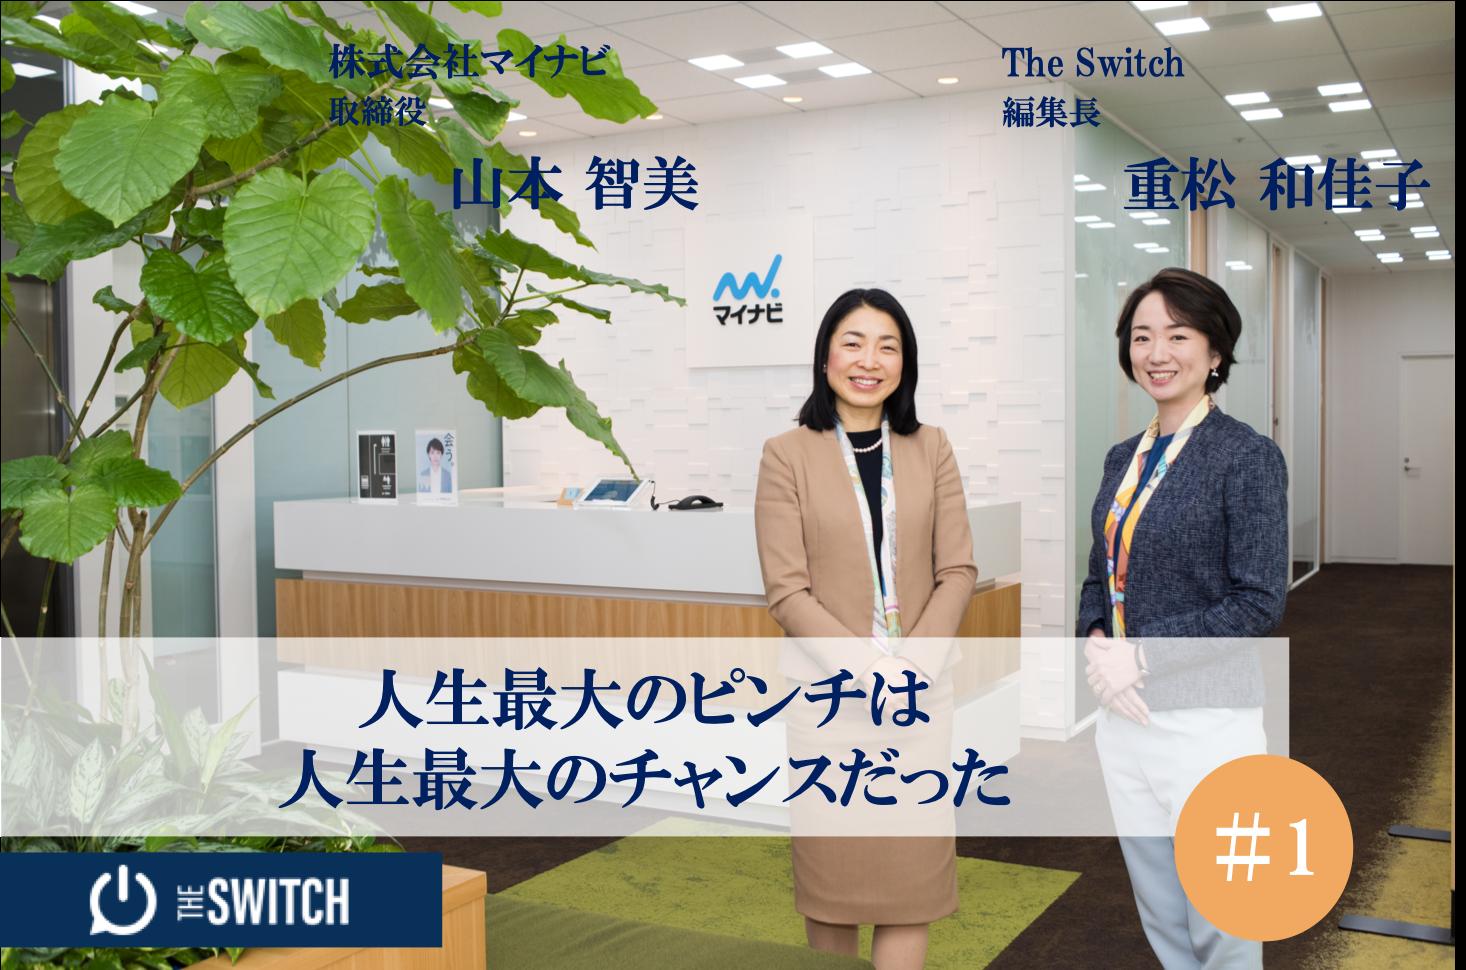 sekiguchi1-TOP.jpg